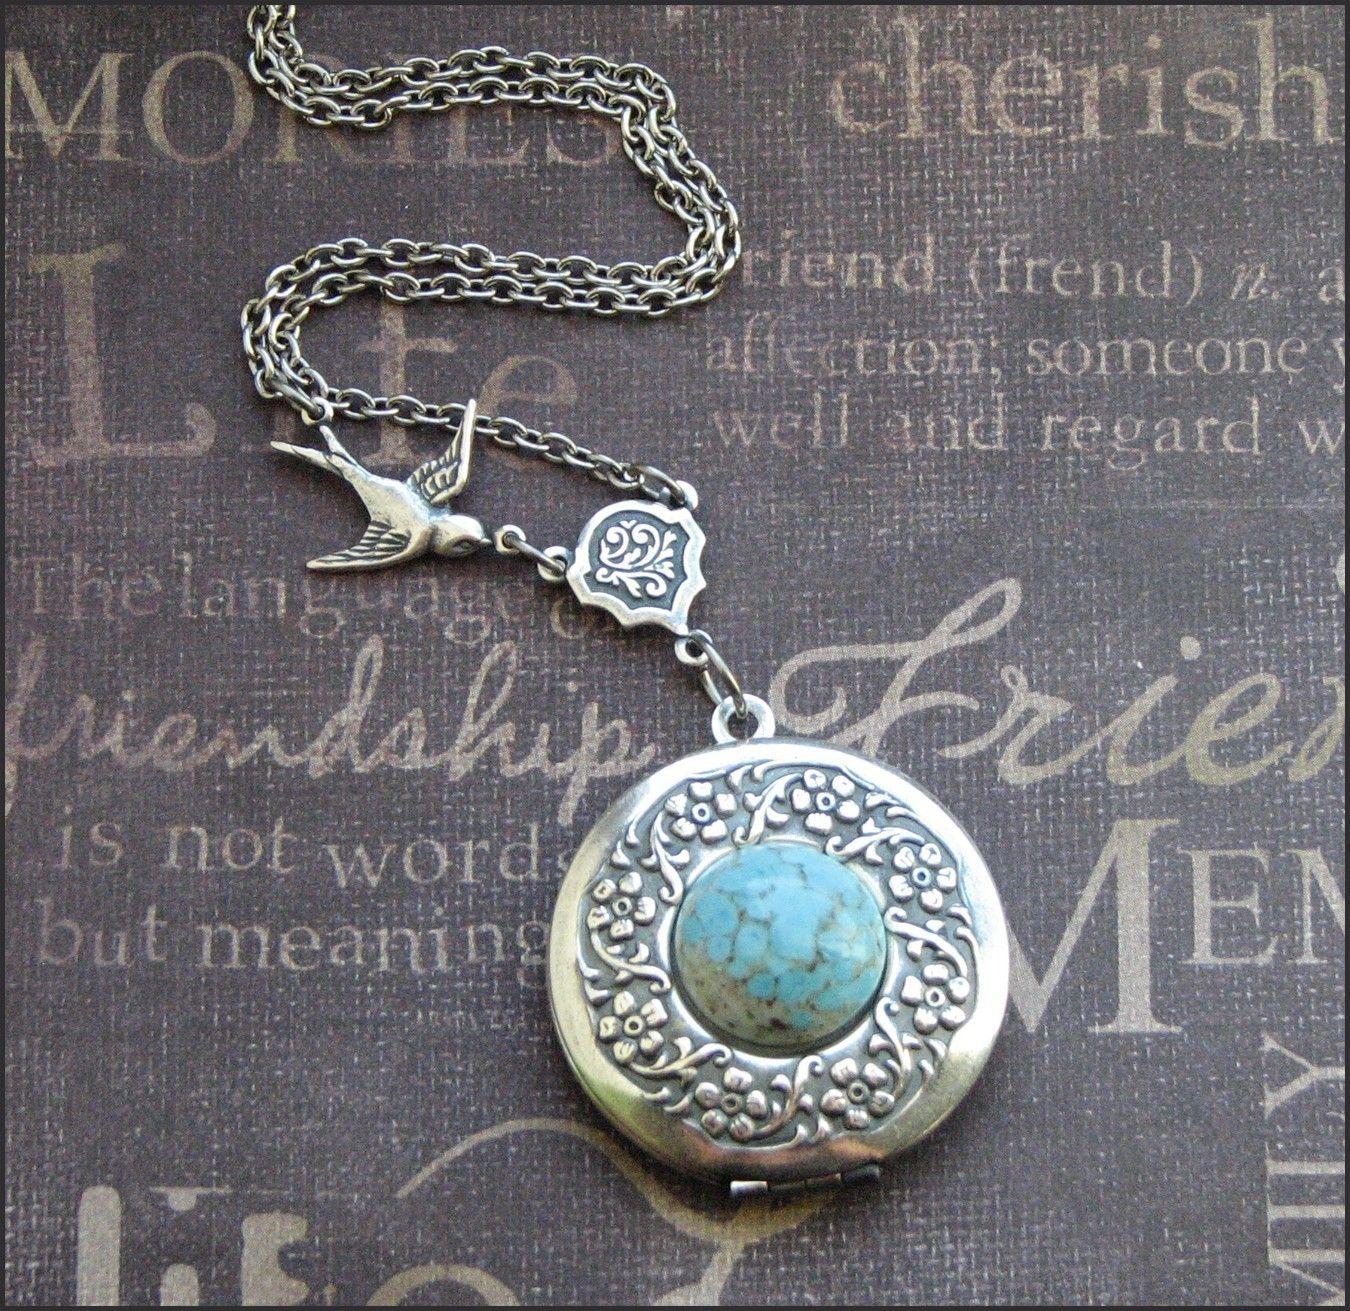 Necklace Locket - Silver Wreath Locket Necklace - Enchanted Robin Egg - Antique Silver - Handmade by TheEnchantedLocket. $37.00, via Etsy.